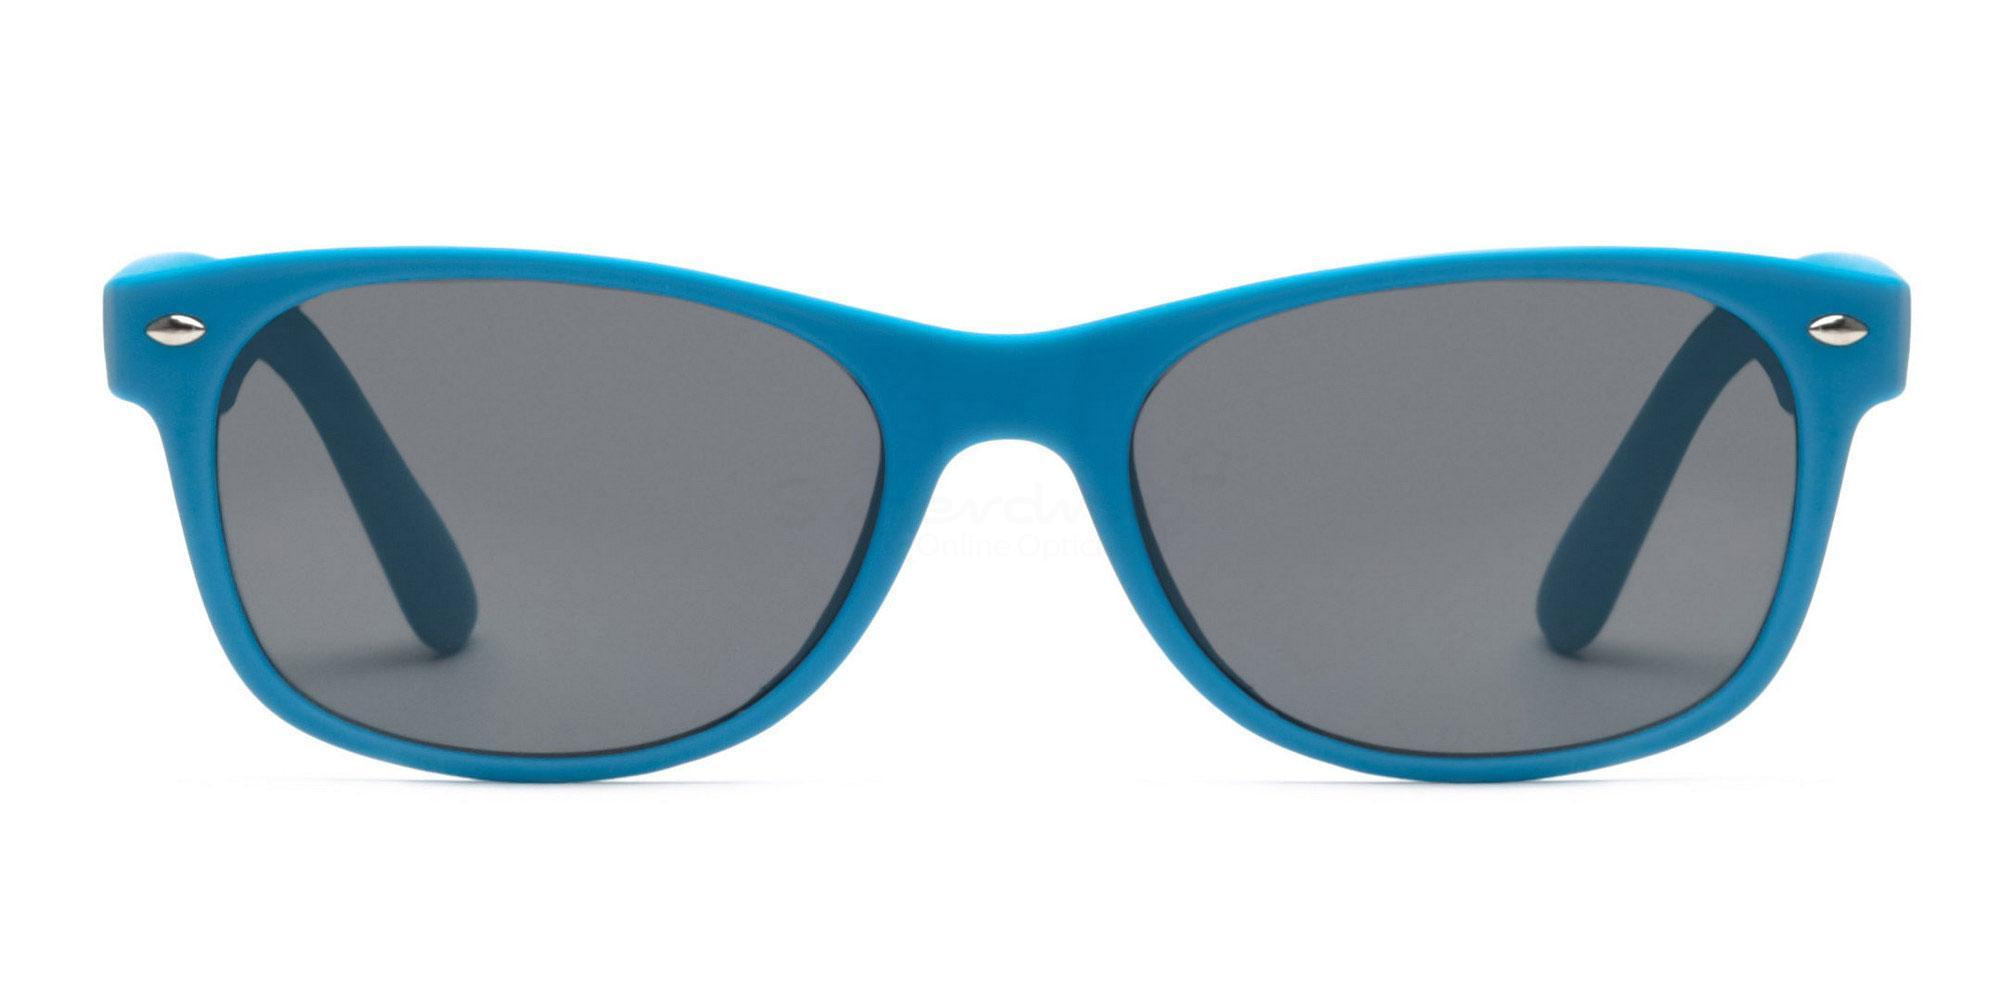 Light Blue S8122 - Light Blue (Sunglasses) Sunglasses, Helium